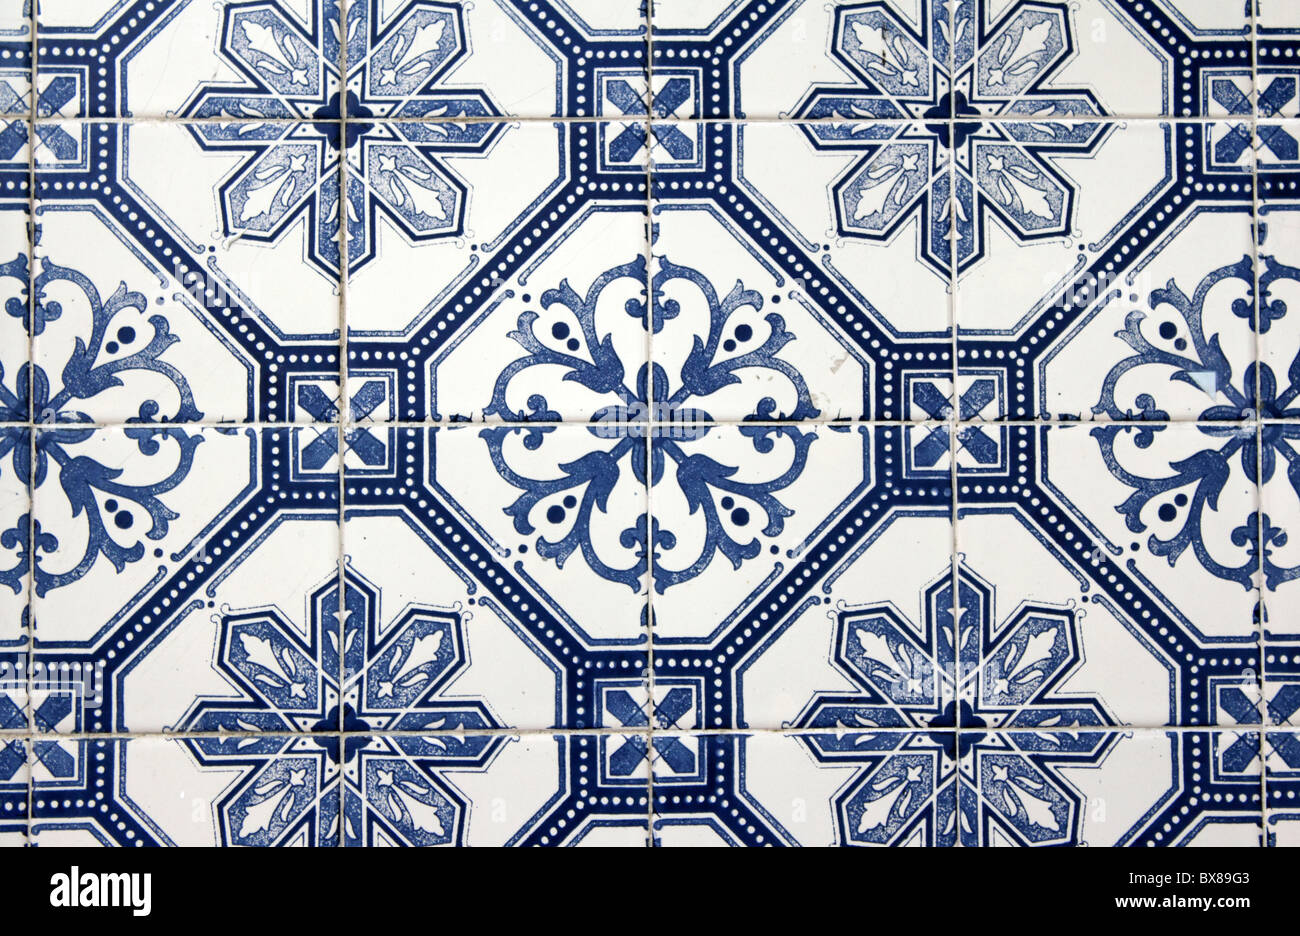 Decorative tiles (azulejos), Alfama, Lisbon, Portugal - Stock Image